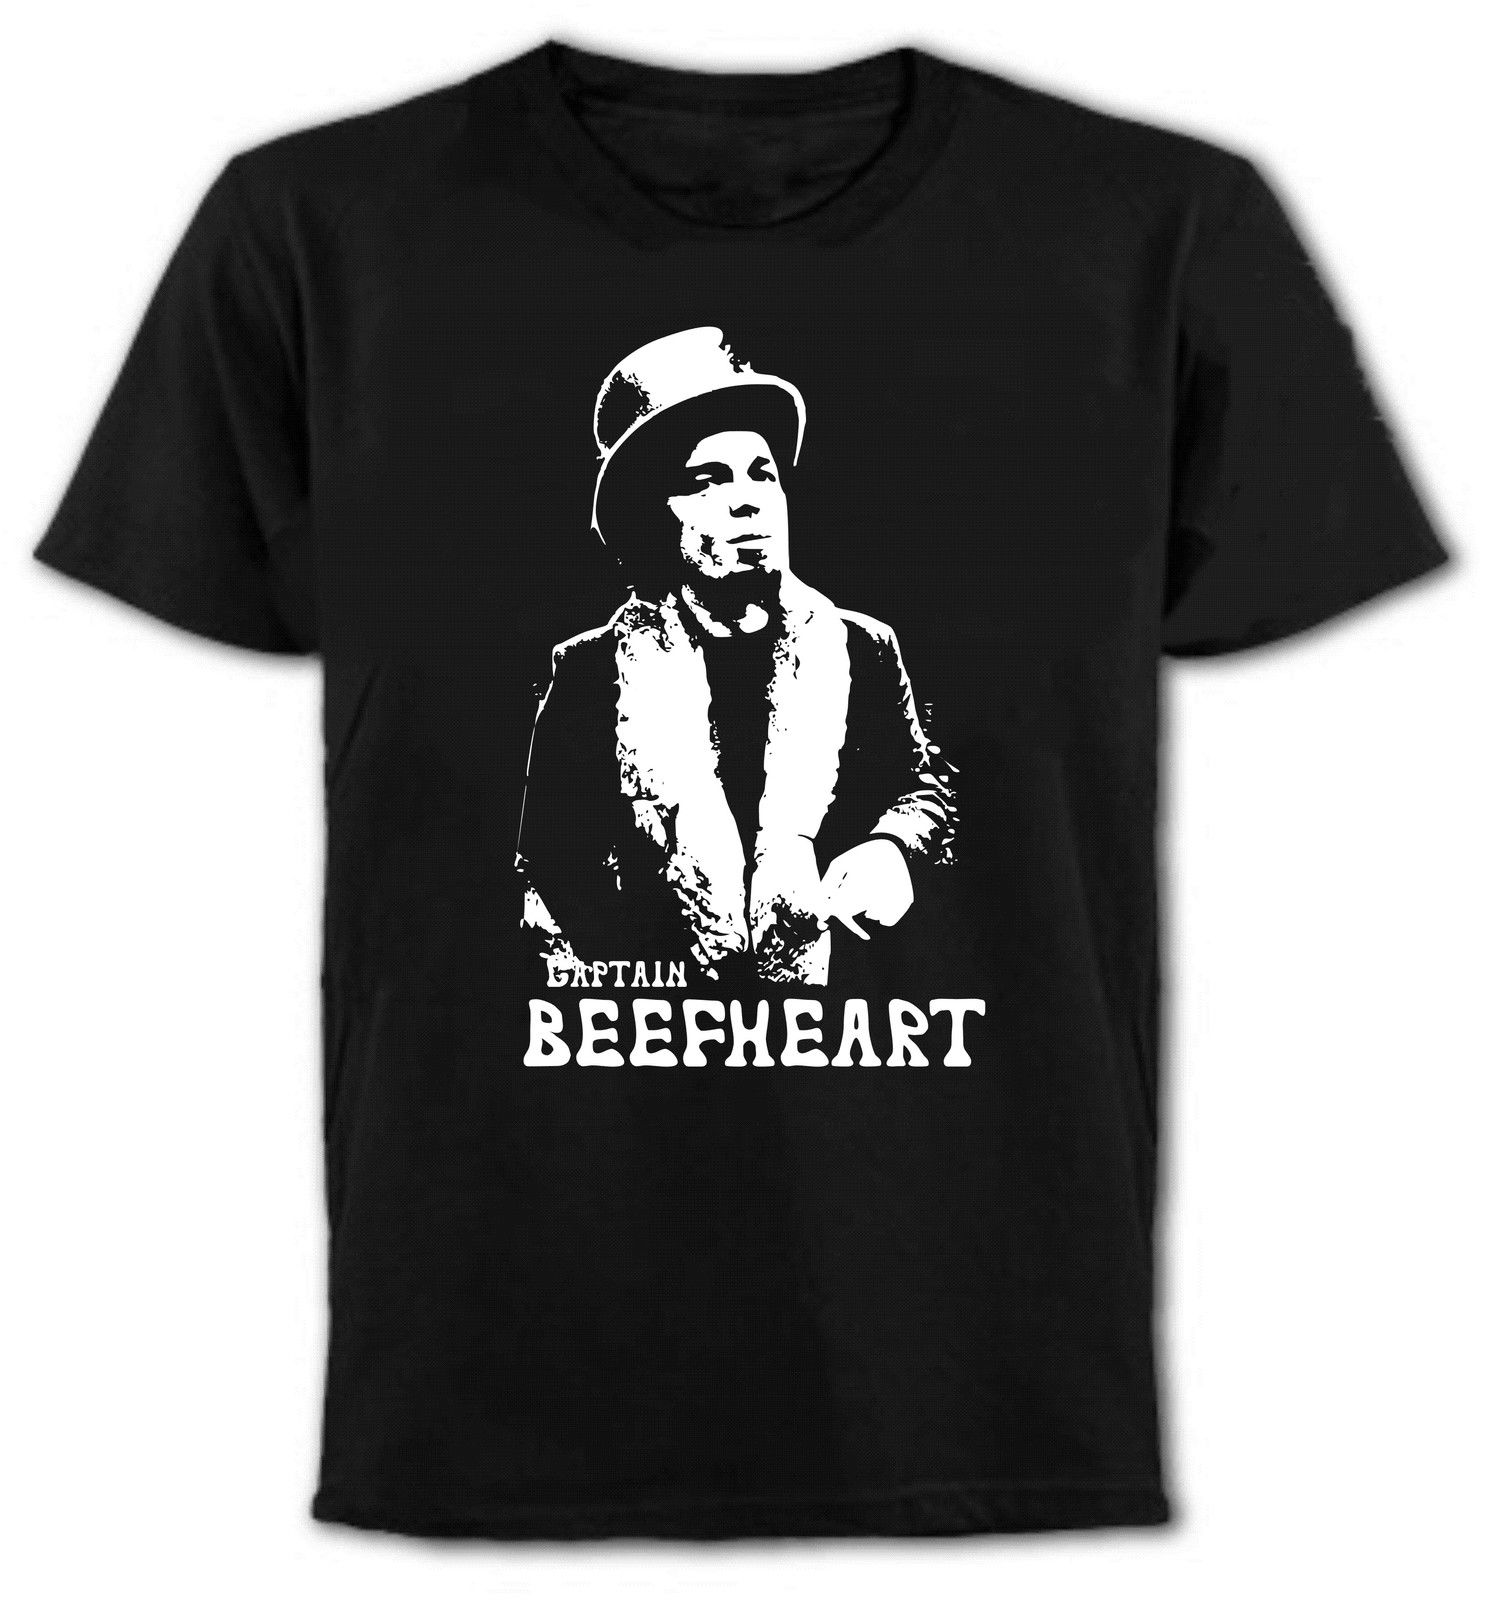 Awesome T Shirts Top Men  Captain Beefheart Rock Icon O-Neck Short-Sleeve Shirt